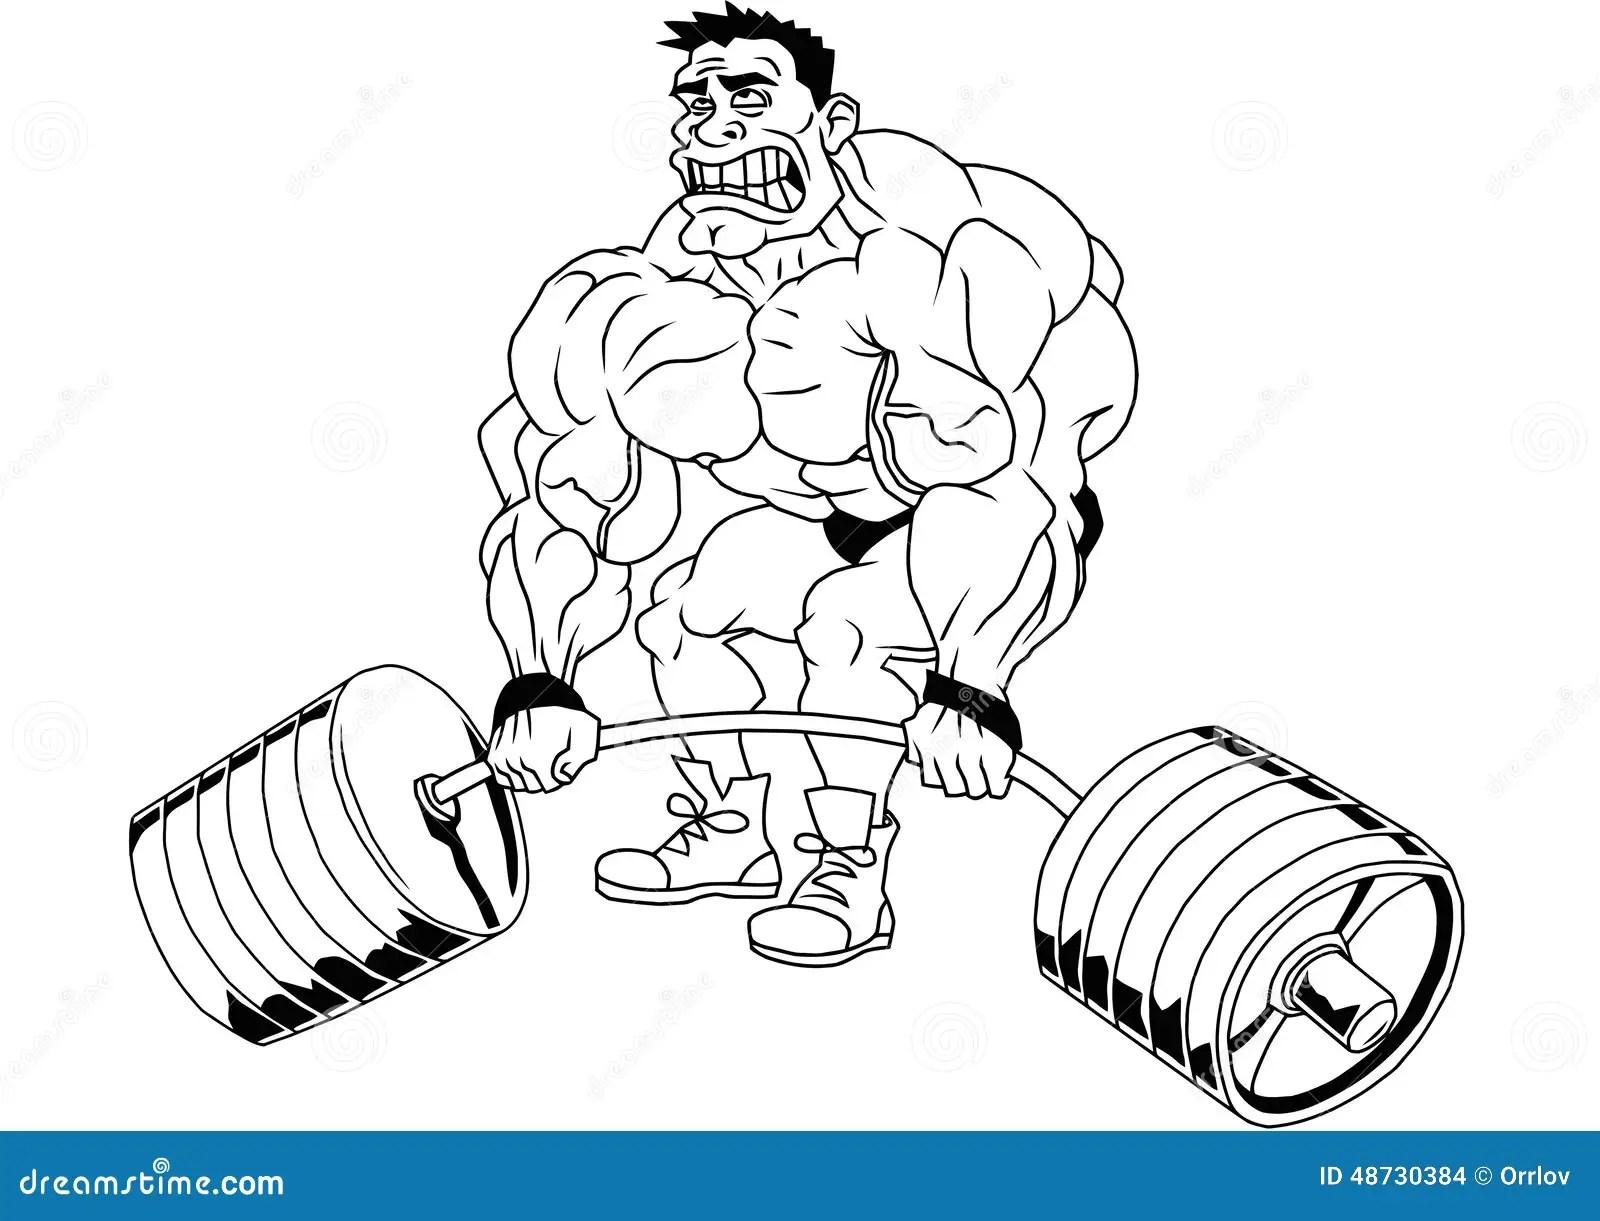 Lustiger Bodybuilder Der Karikatur Vektor Abbildung